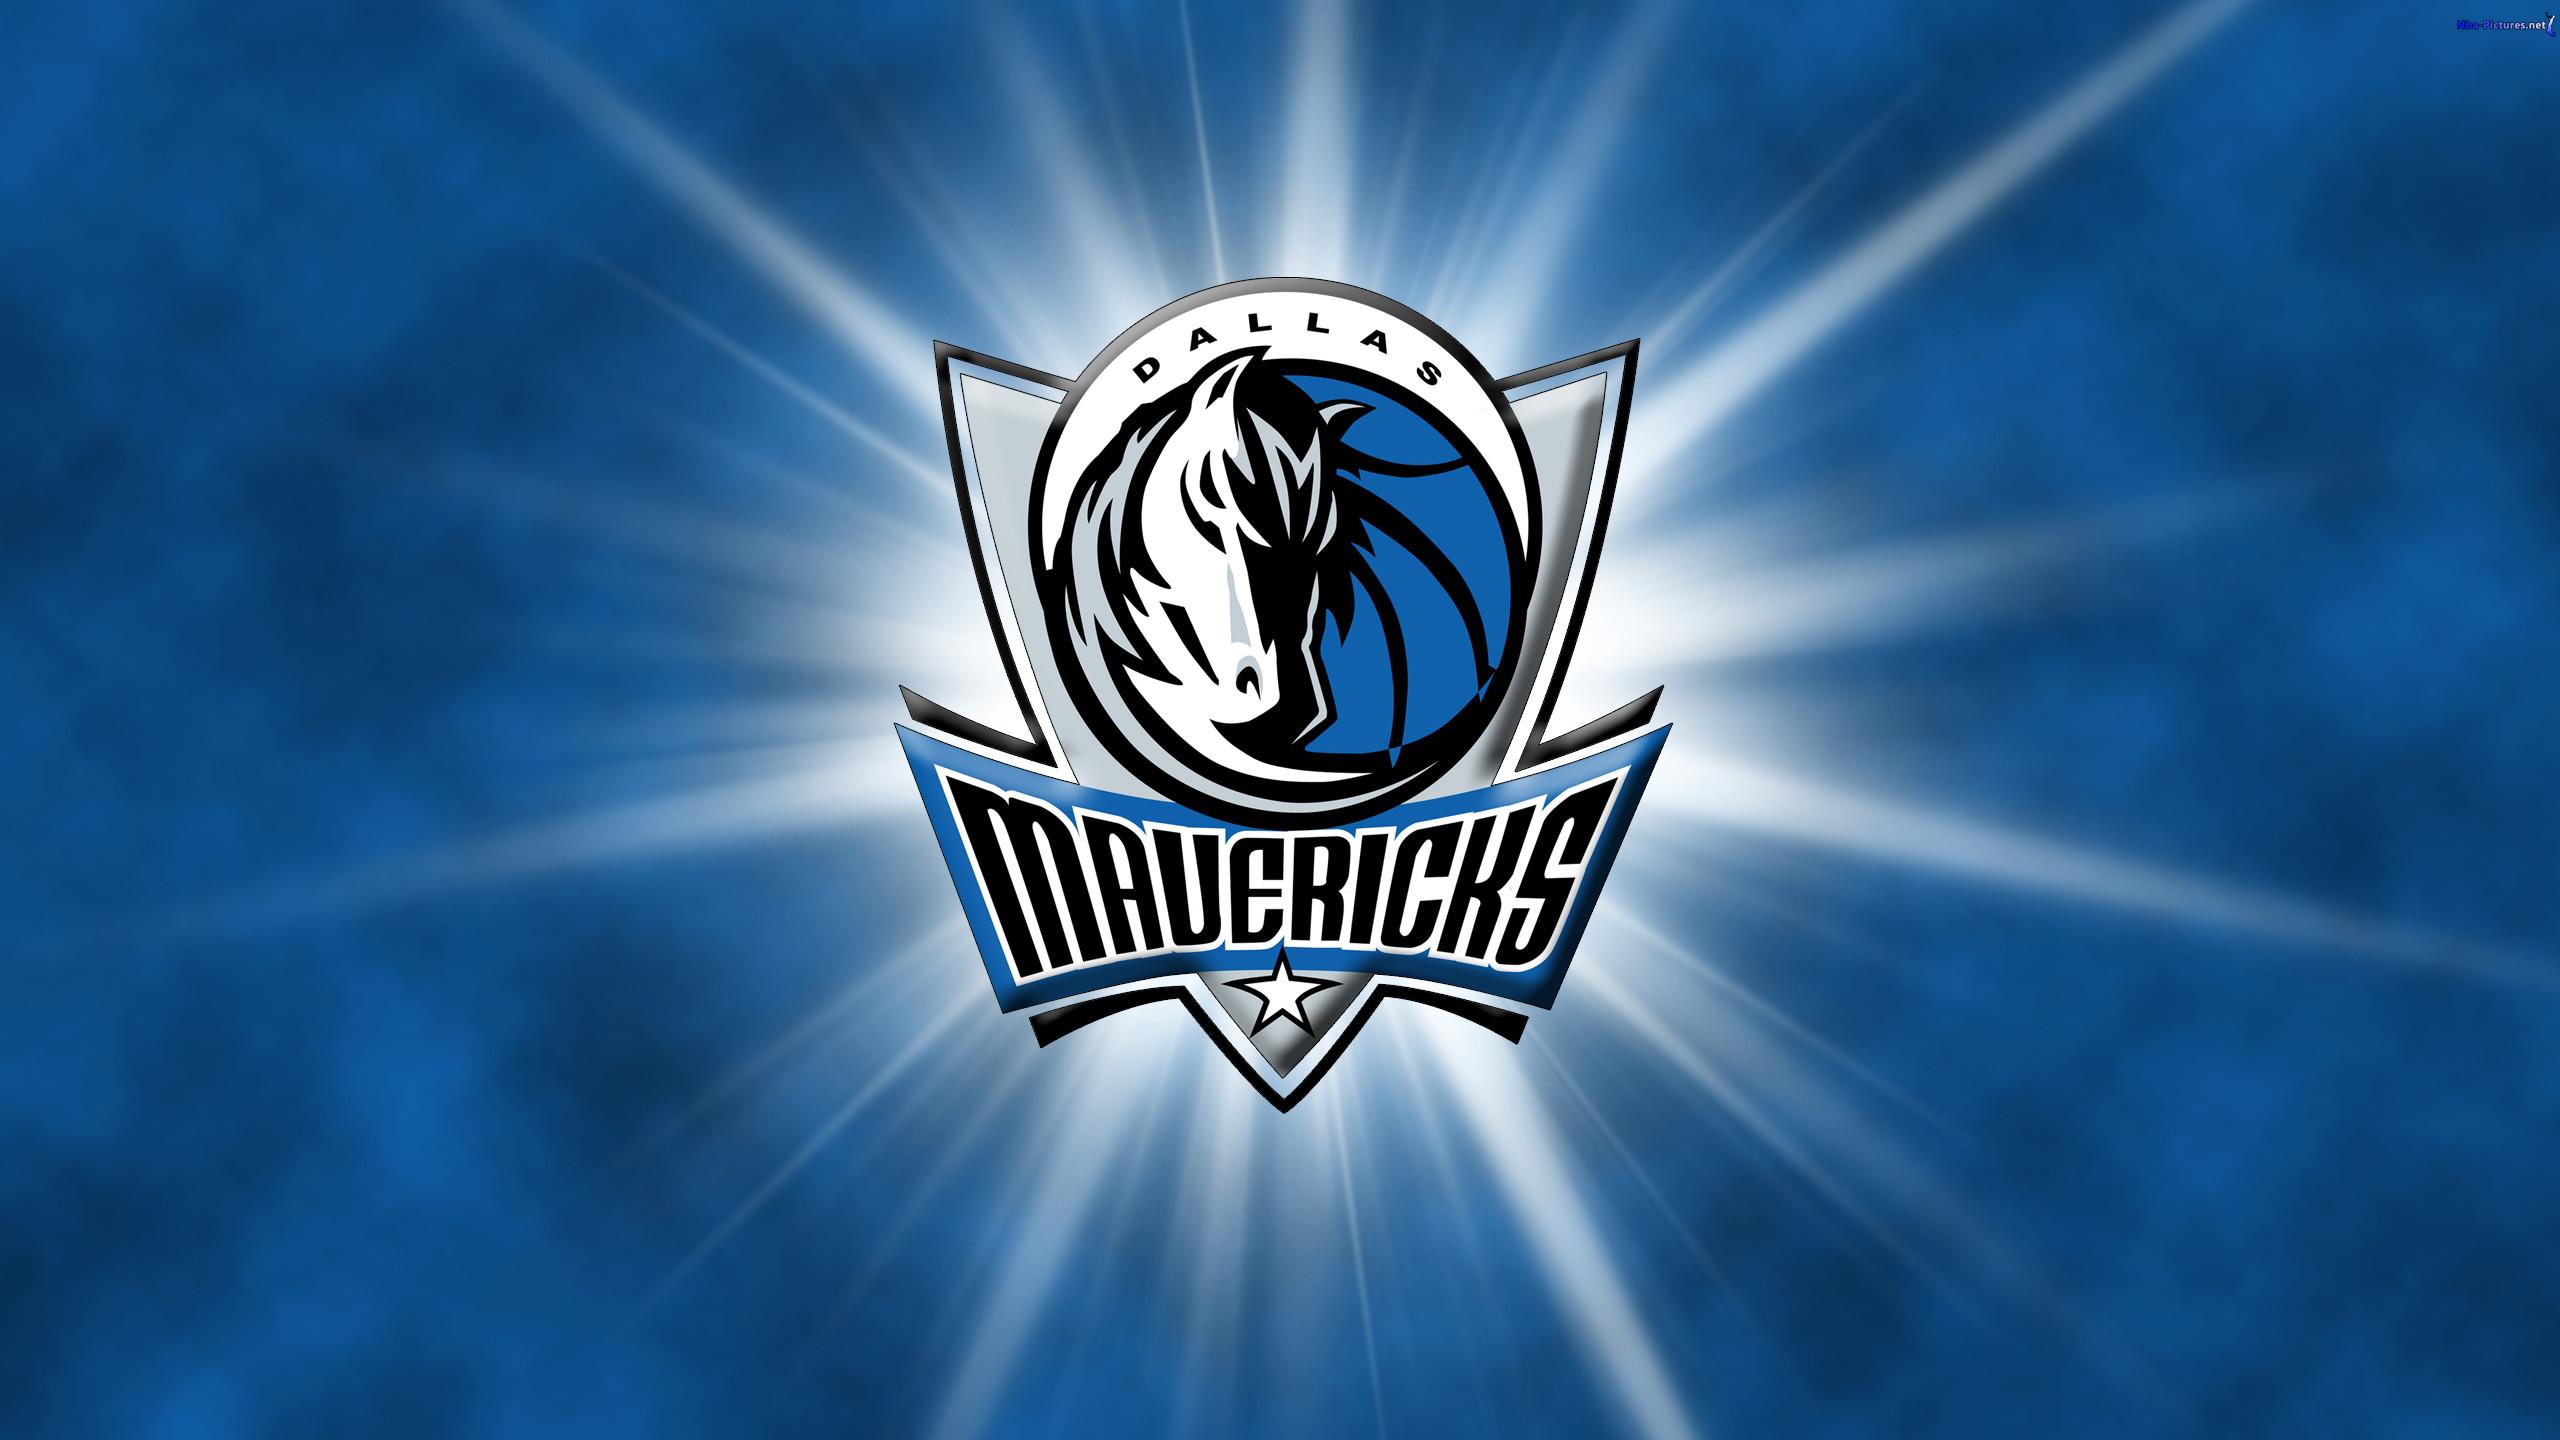 Backgrounds Dallas Mavericks HD | 2020 Basketball Wallpaper |Dallas Mavericks Wallpapers